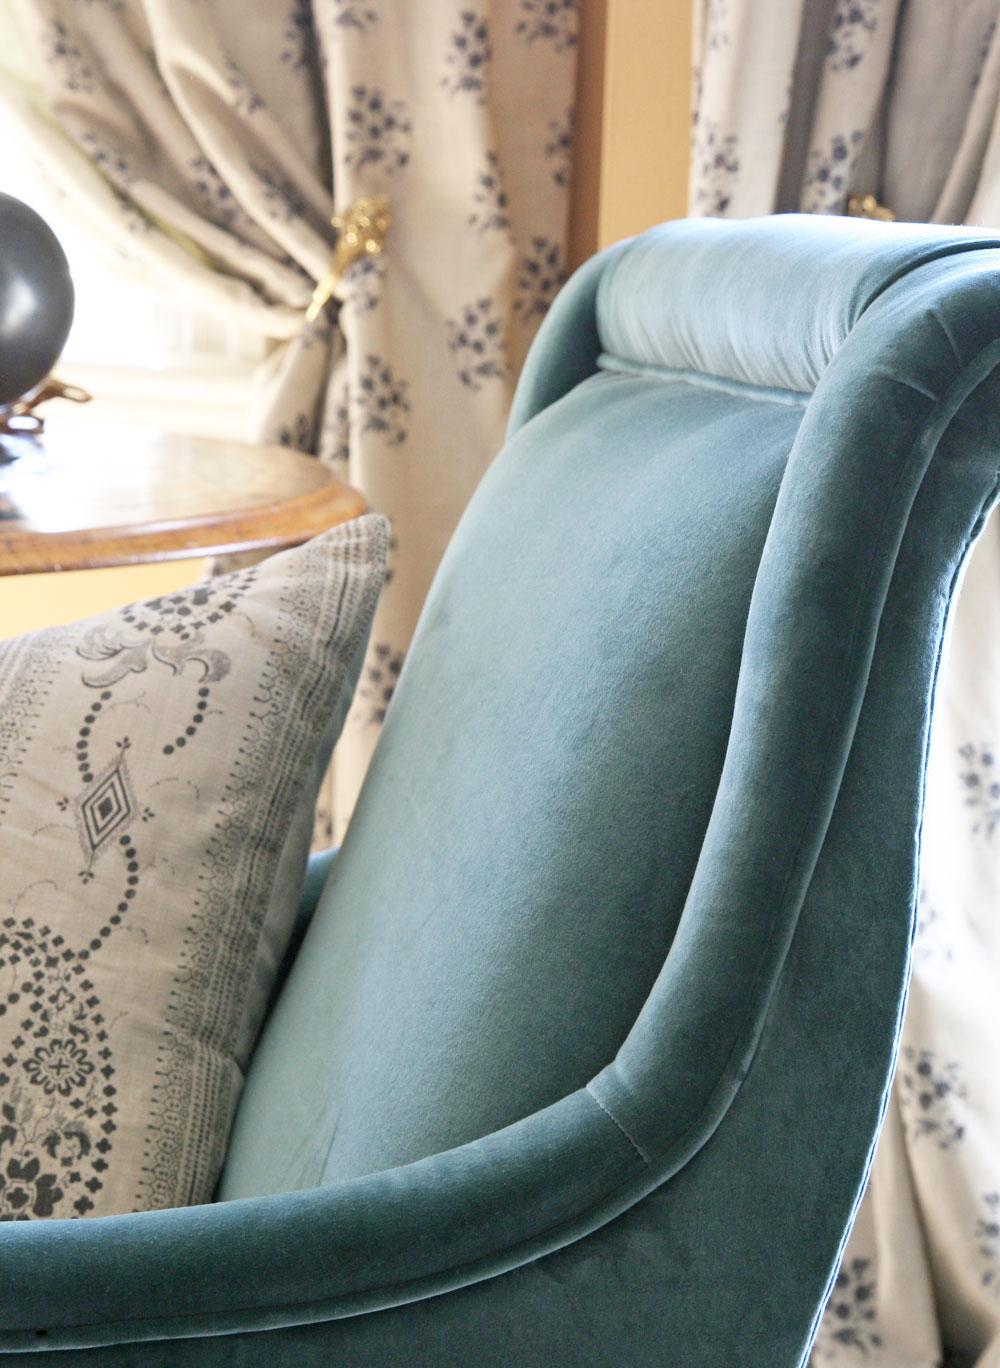 teal-velvet-chair-close-up